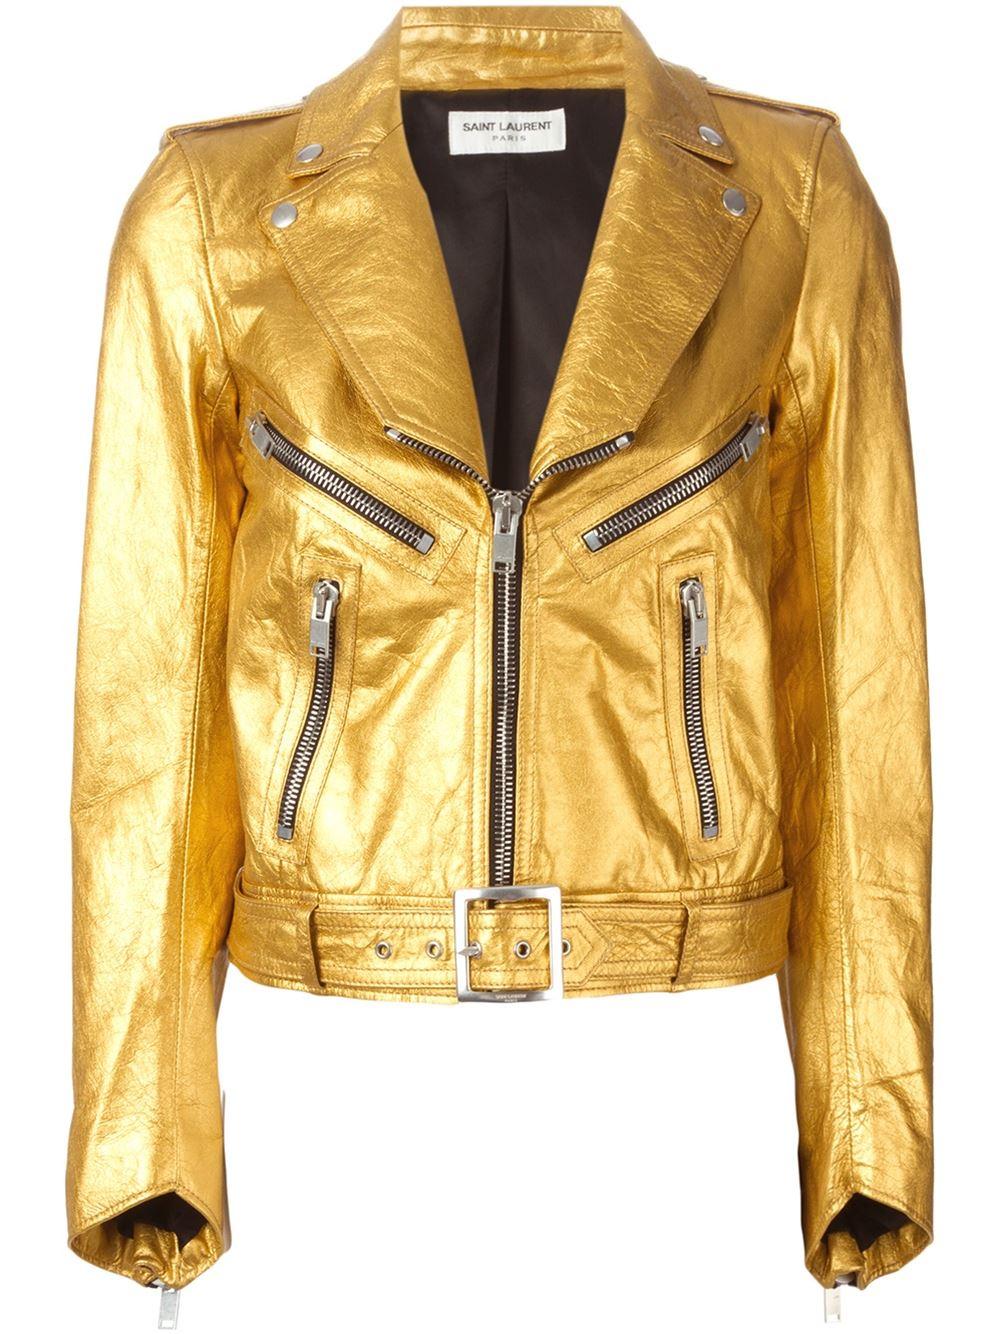 Saint laurent metallic gold leather biker jacket